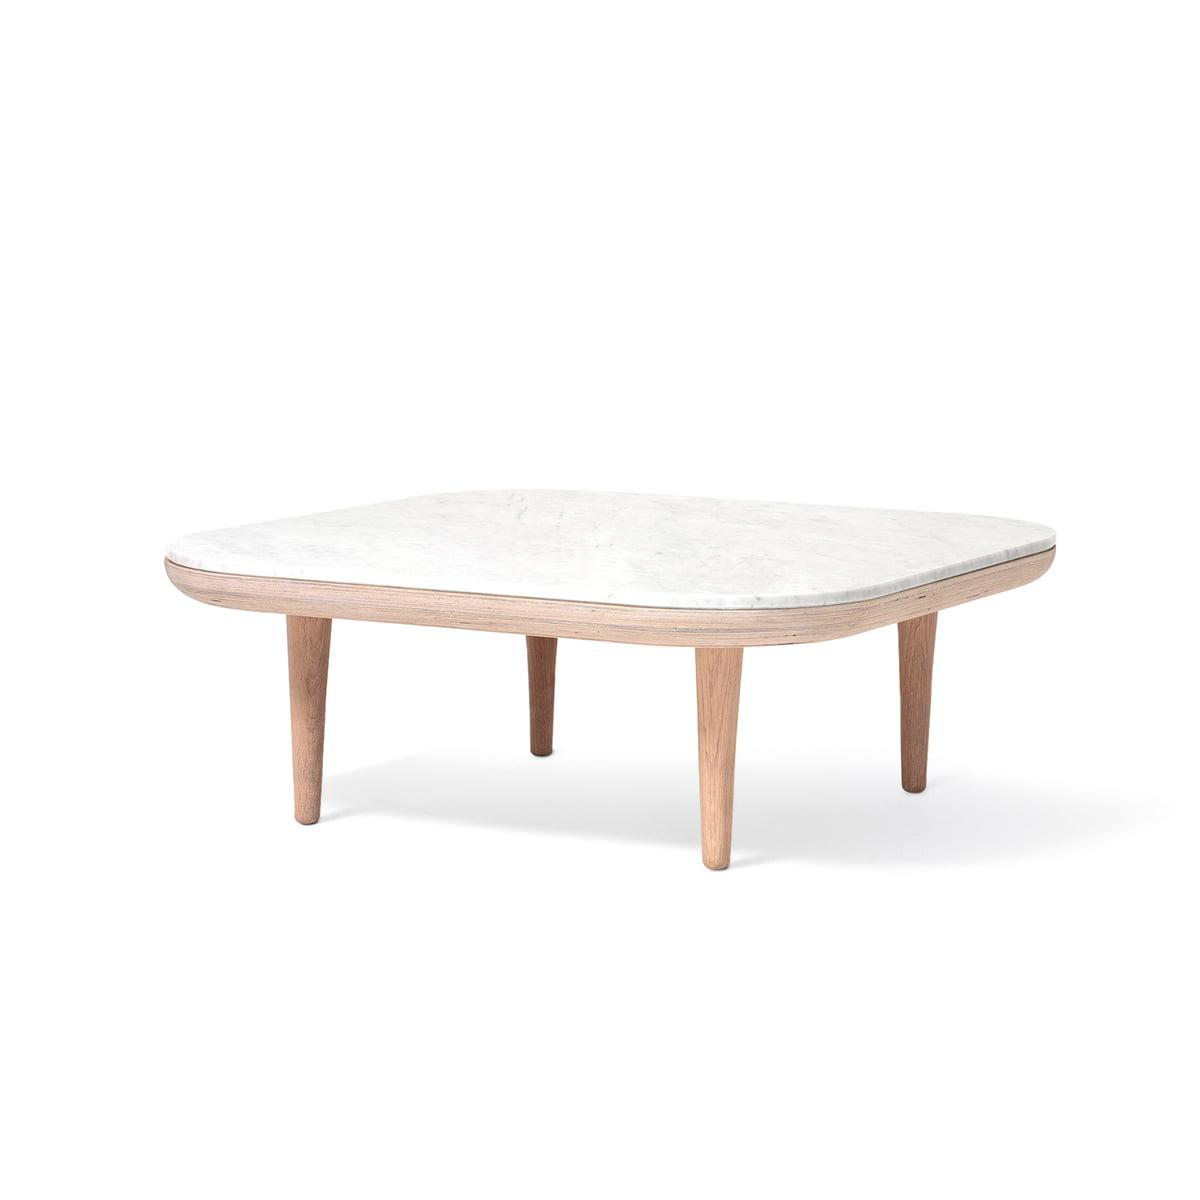 & tradition - Table basse fly sc4, 80 x 80 cm, chêne blanc/marbre bianco  carrara